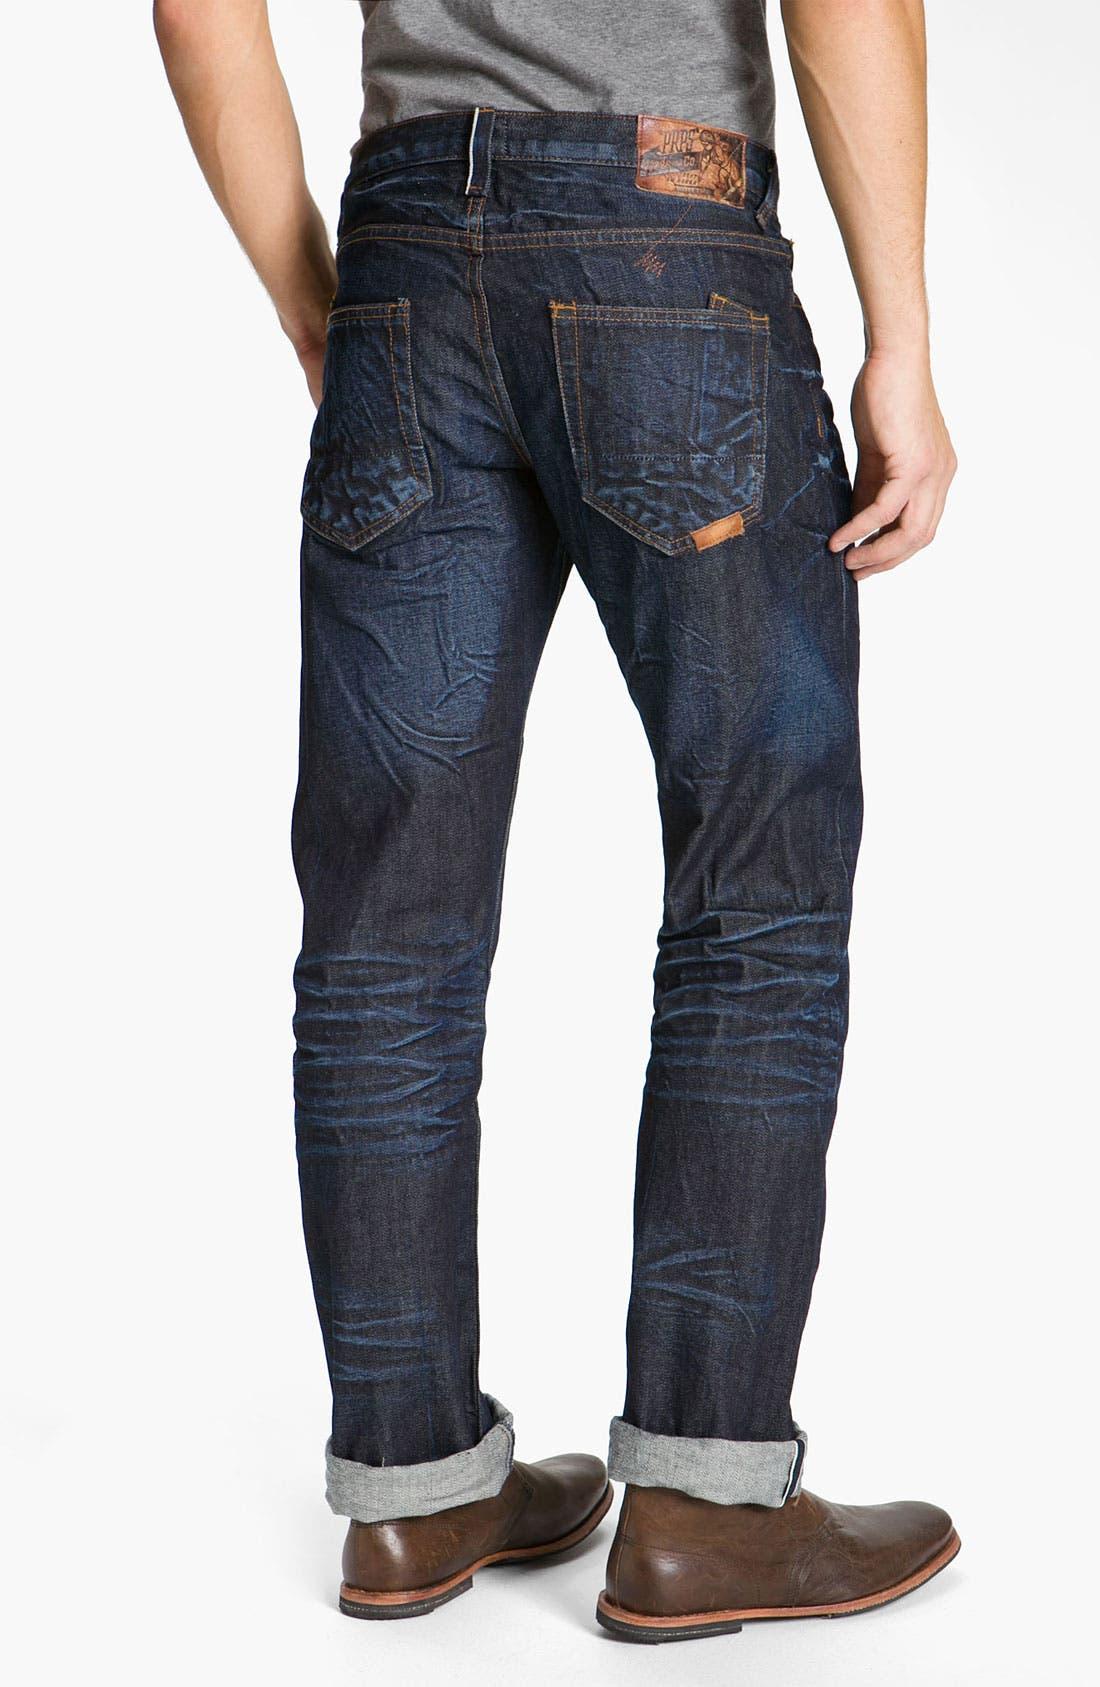 Main Image - PRPS 'Snowy Crevasses Barracuda' Straight Leg Jeans (1 Year Wash)